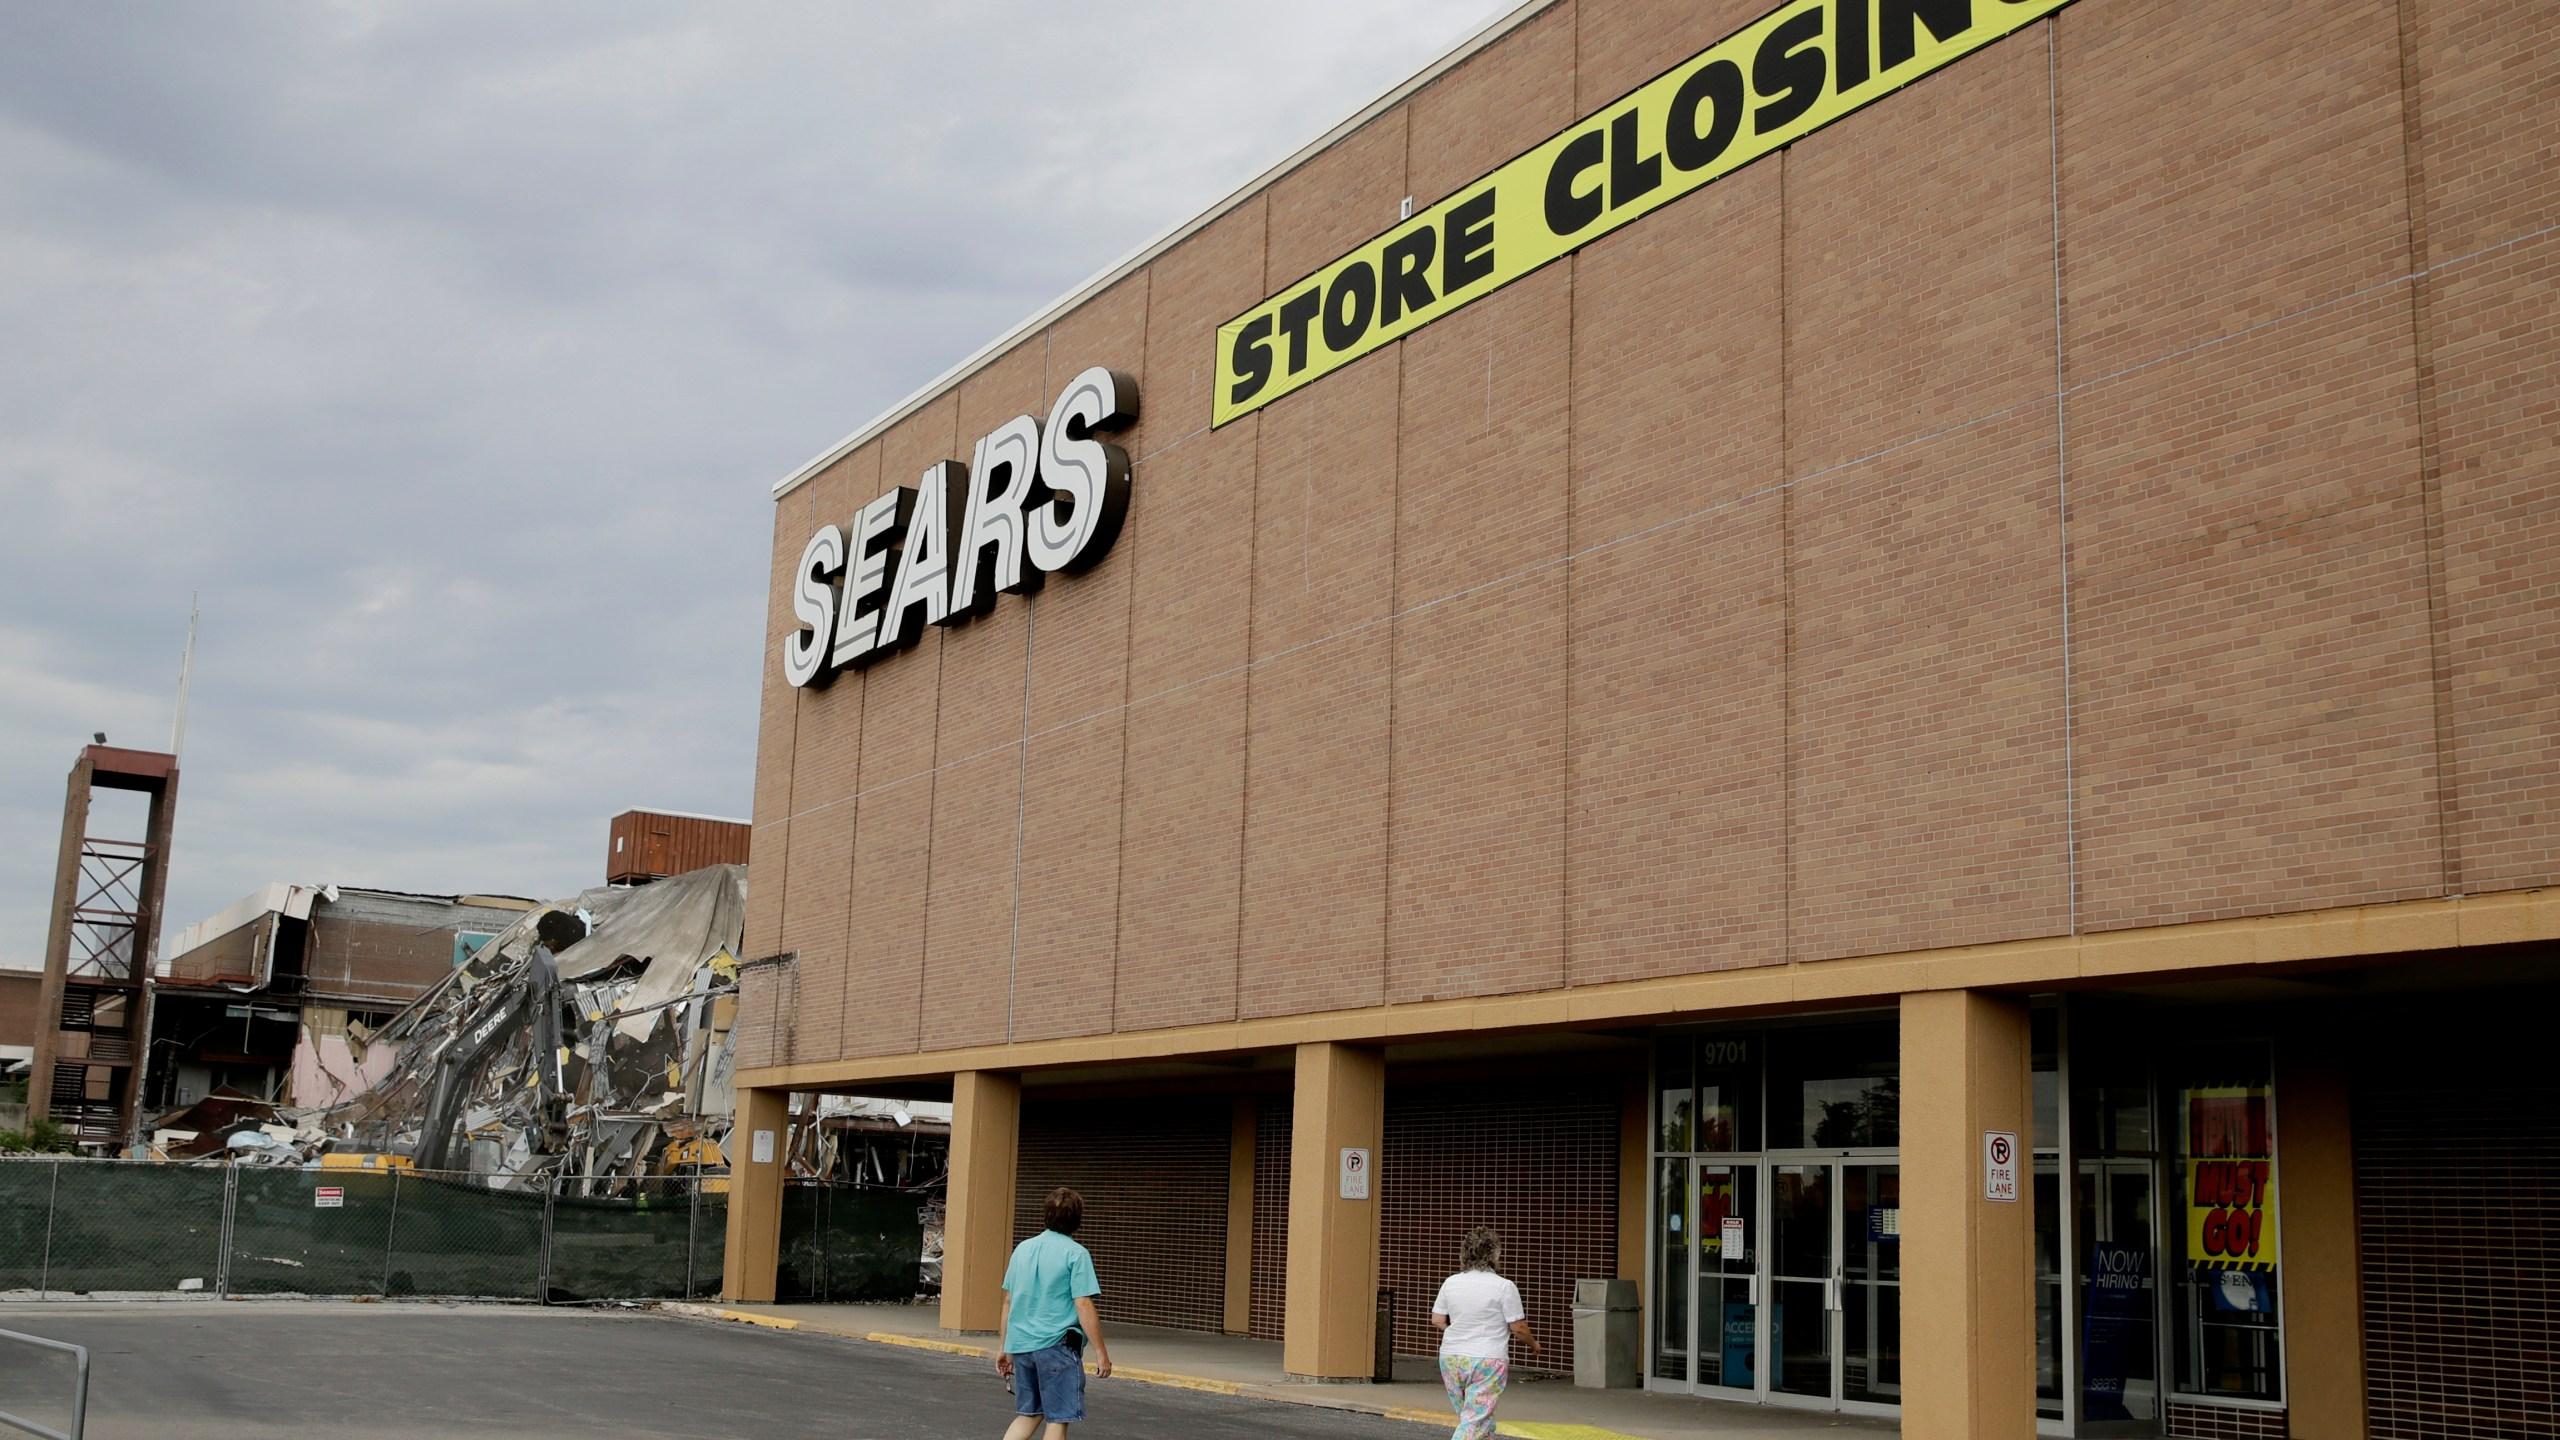 Sears_25780-159532.jpg15033472